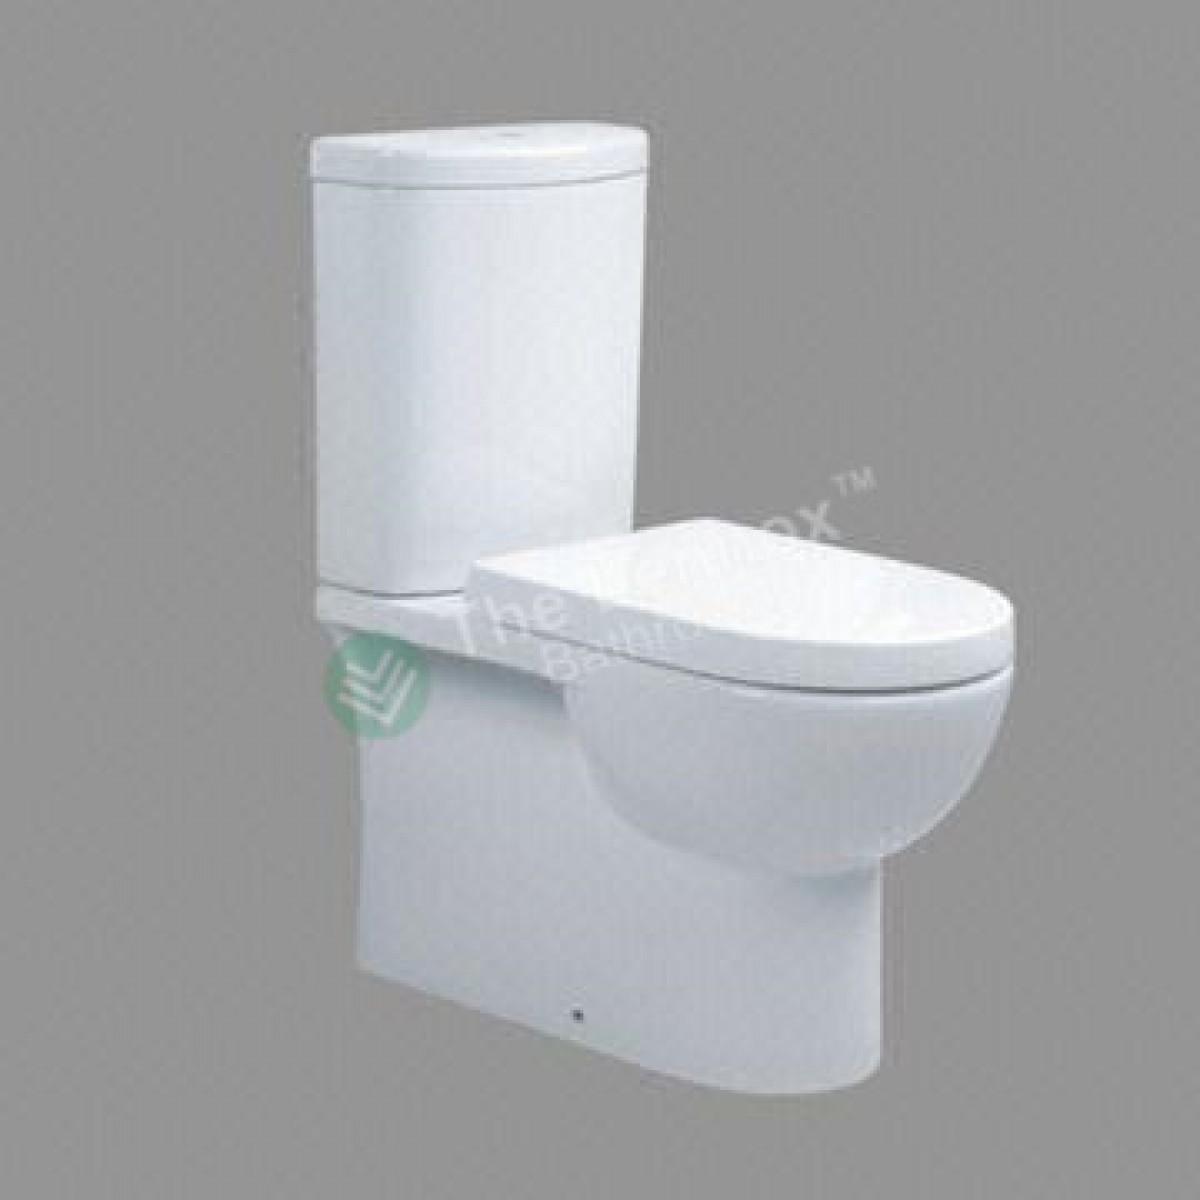 toilet bidet combo nz combined bidet toilet toilet bidet. Black Bedroom Furniture Sets. Home Design Ideas